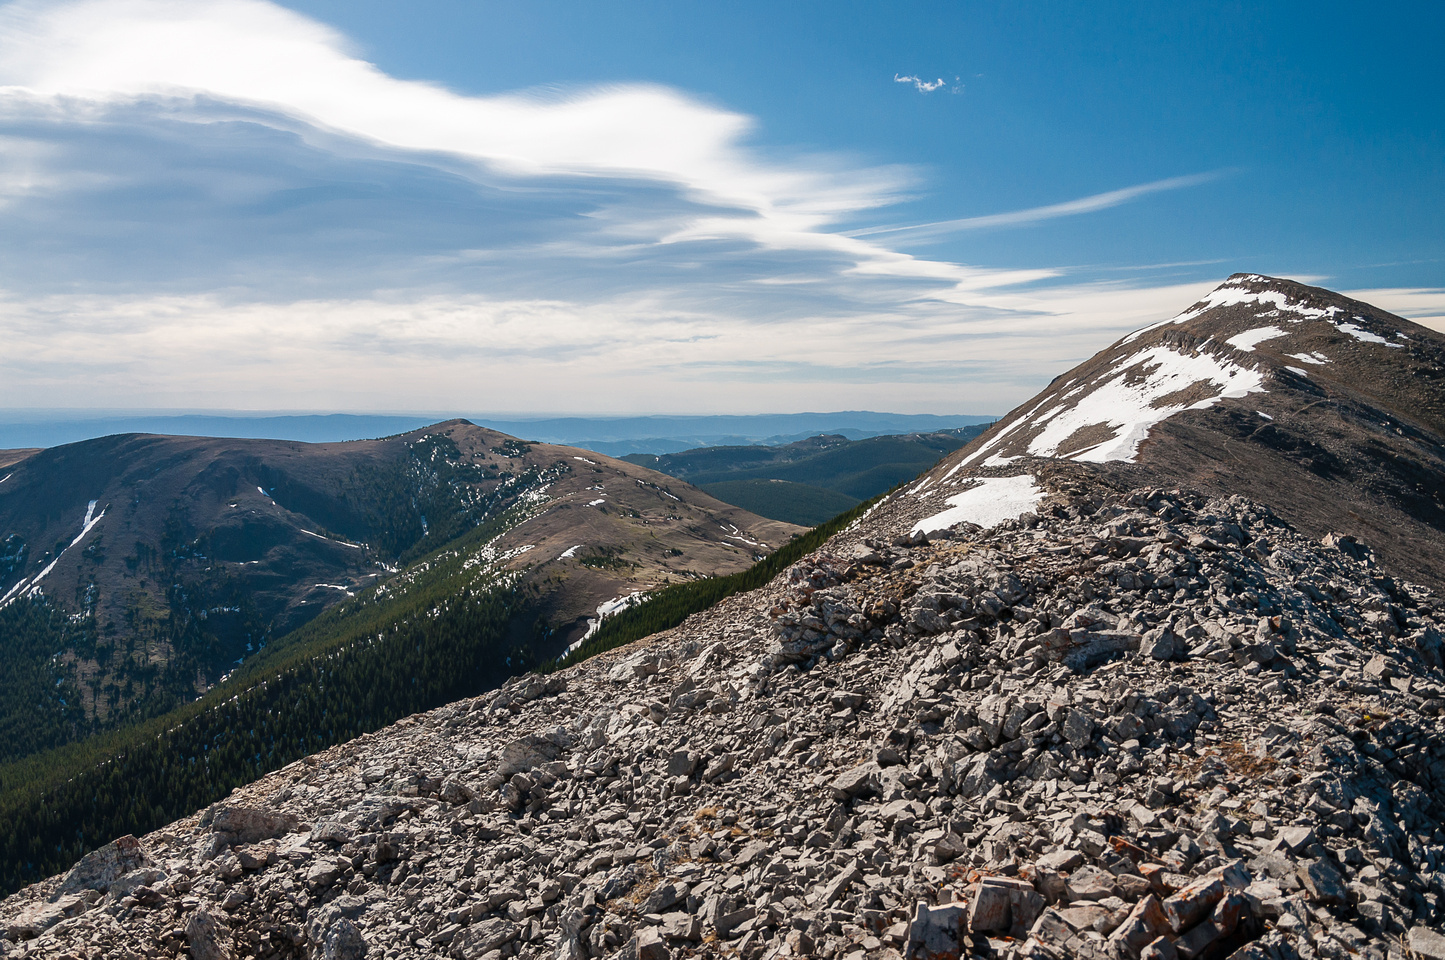 Traversing the north ridge of Coffin.